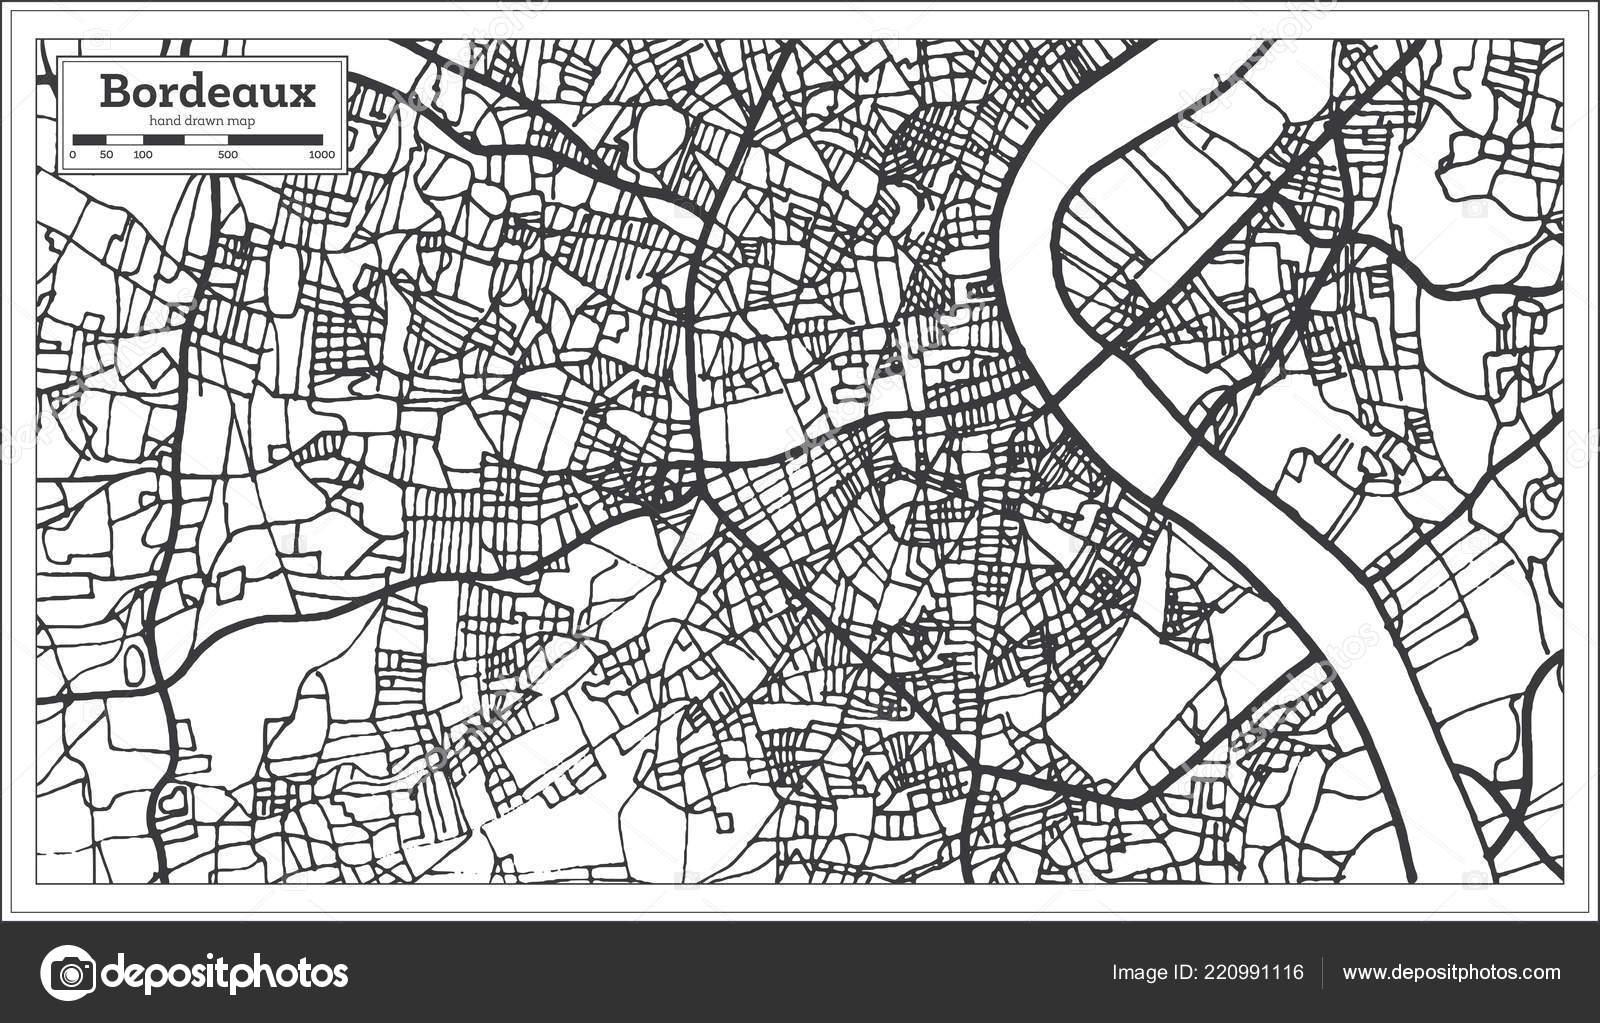 Bordeaux France City Map Retro Style Outline Map Vector Illustration